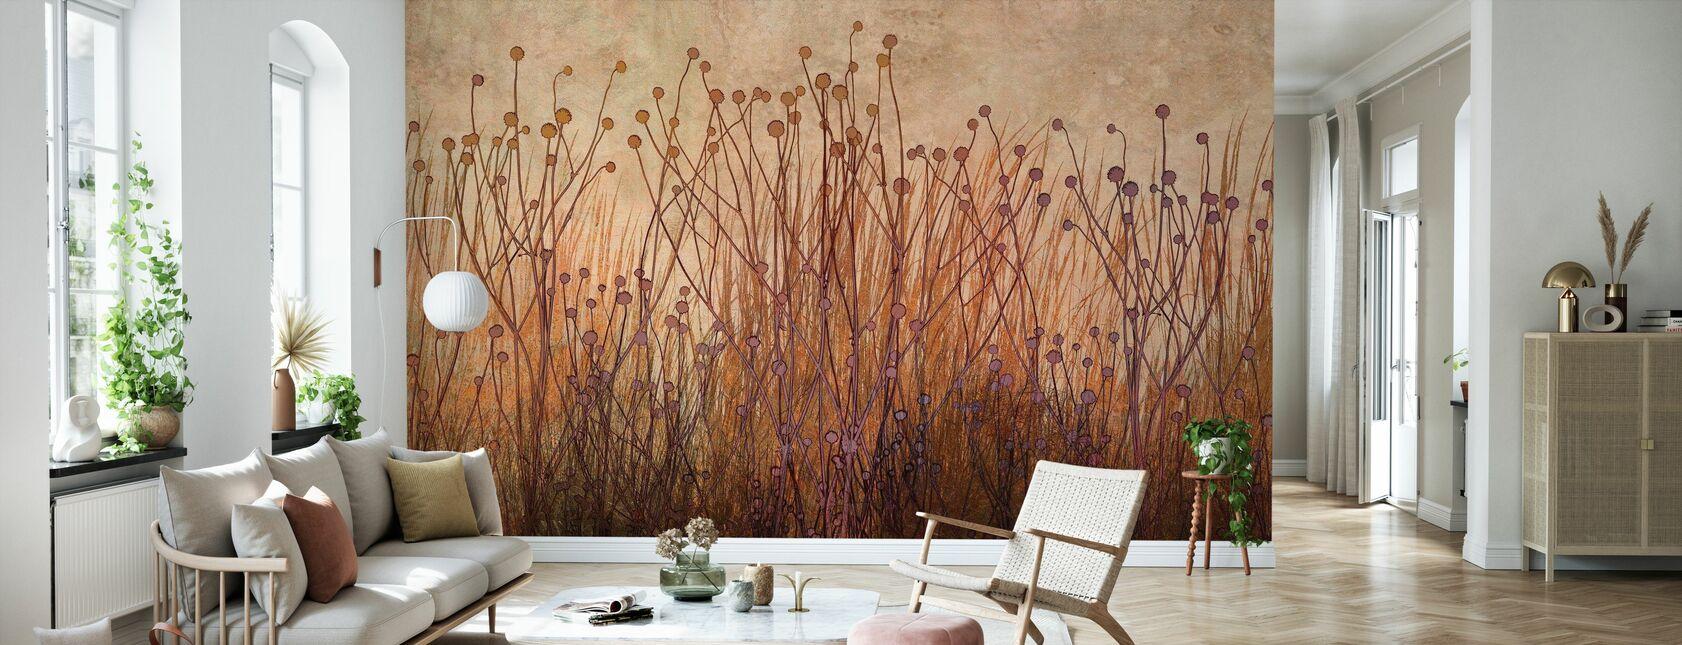 Copper Grass Silhouette - Wallpaper - Living Room